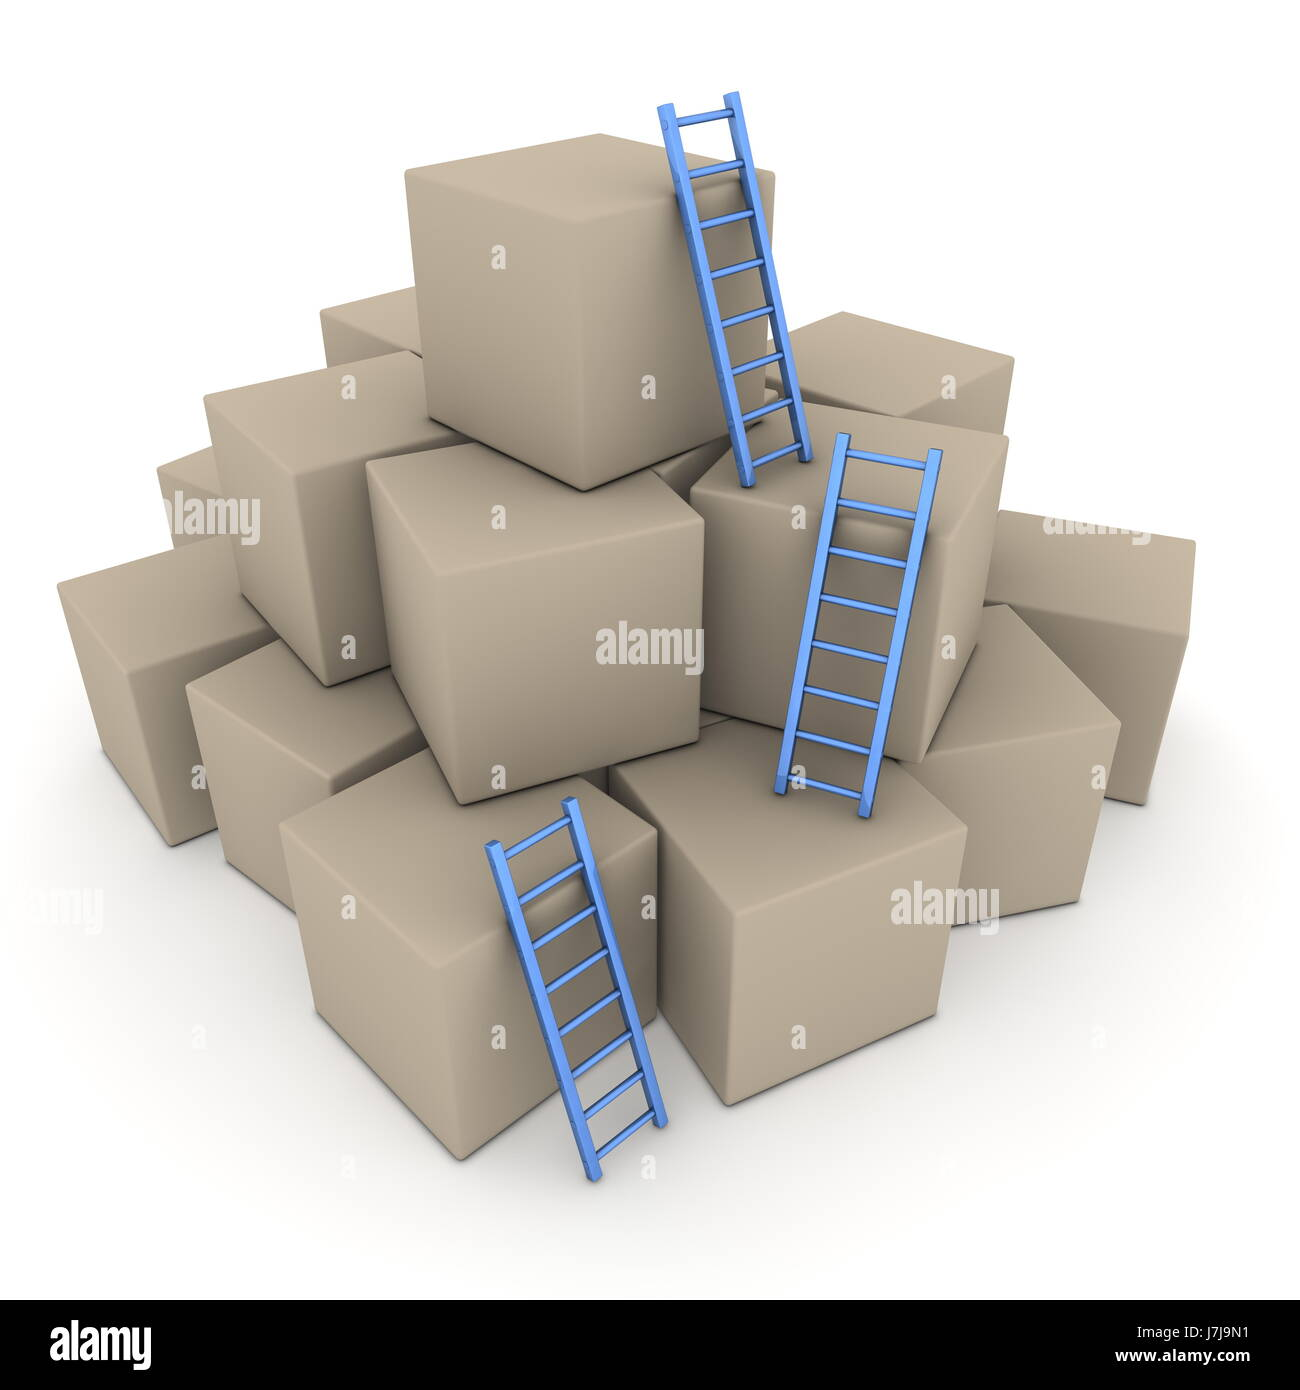 blue stack box boxes ladder heap pile bricks cubes cardboard carton blue stairs - Stock Image